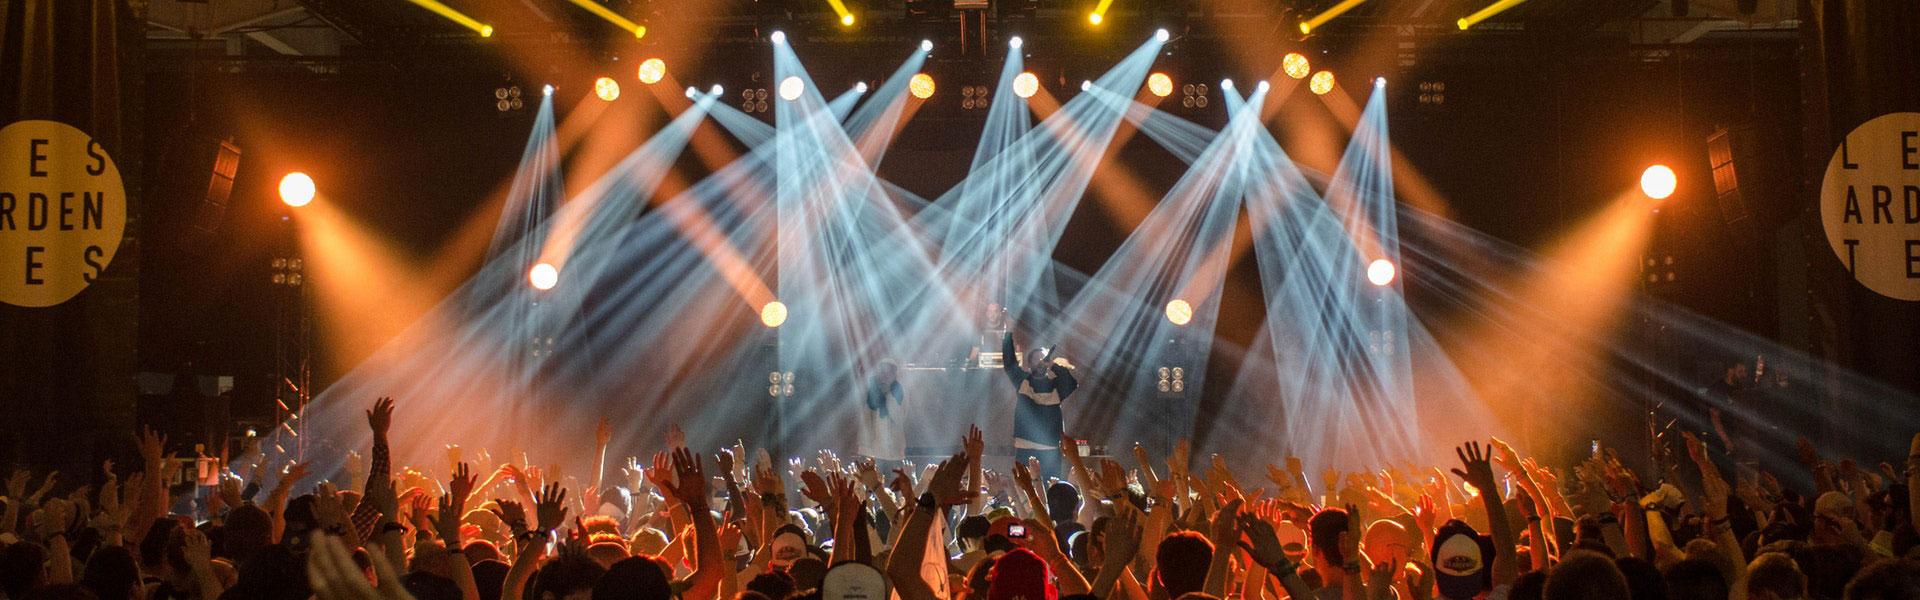 Surplus Concert Pro